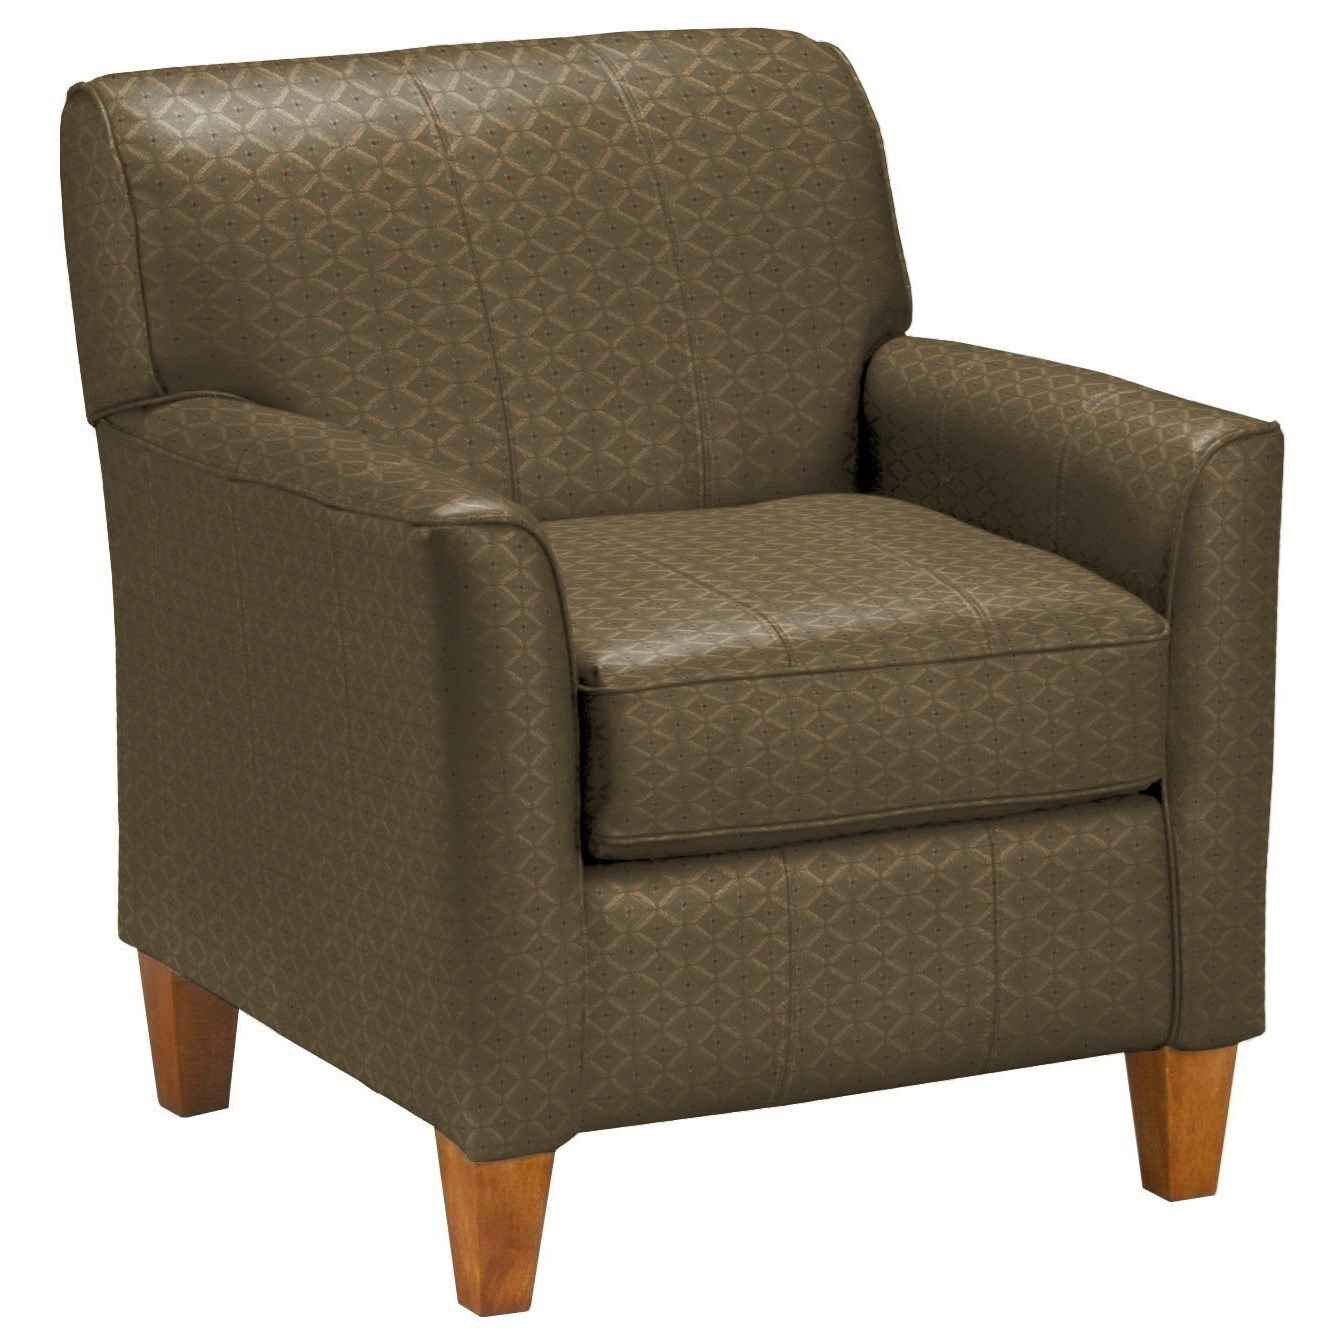 Best Home Furnishings Club Chairs Risa Club Chair